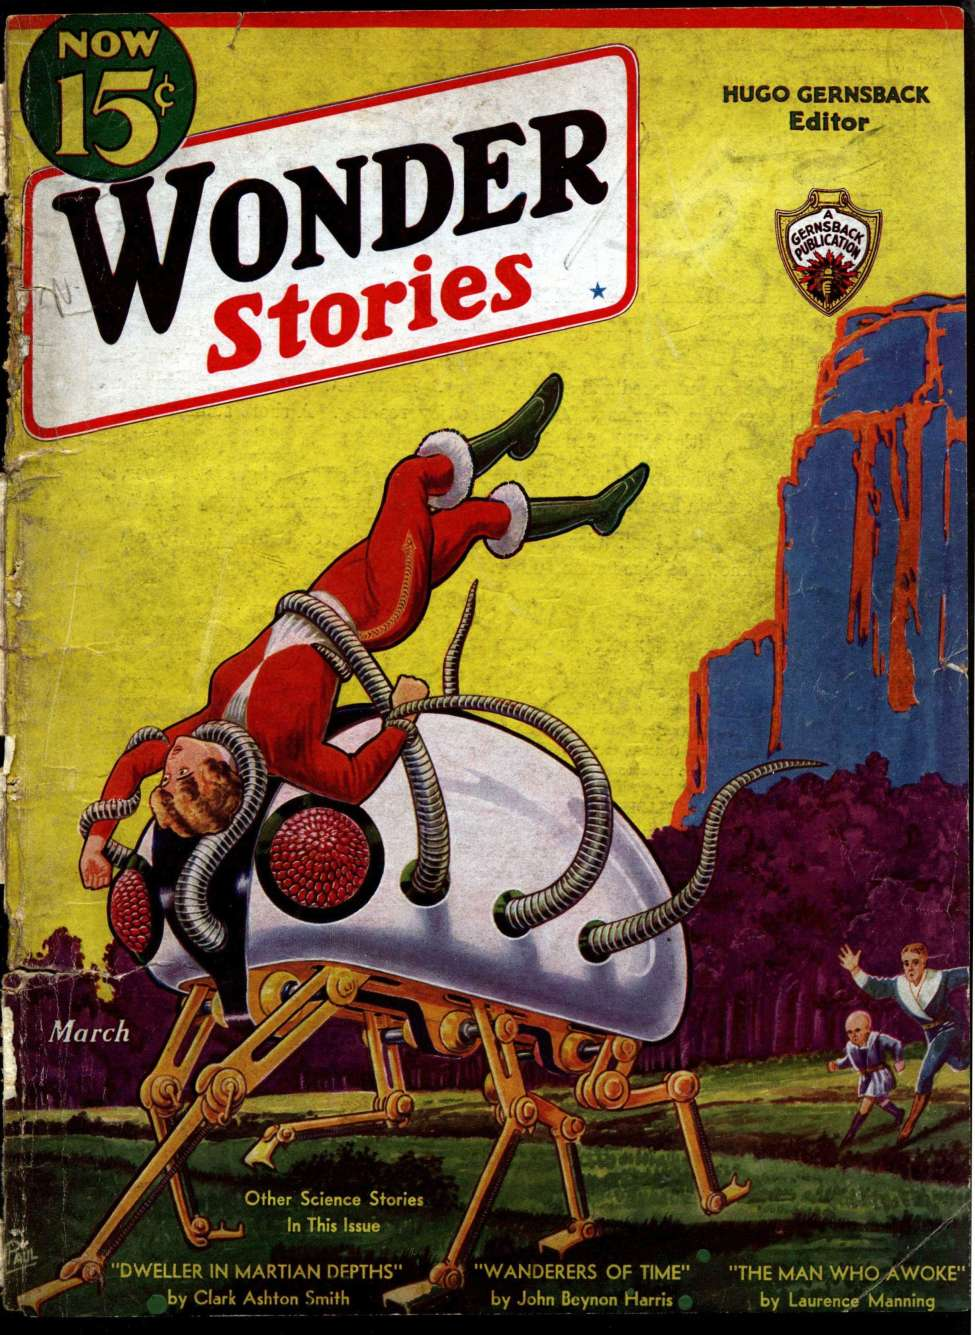 Comic Book Cover For Wonder Stories v4 10 - The Robot Technocrat - Nat Schachner